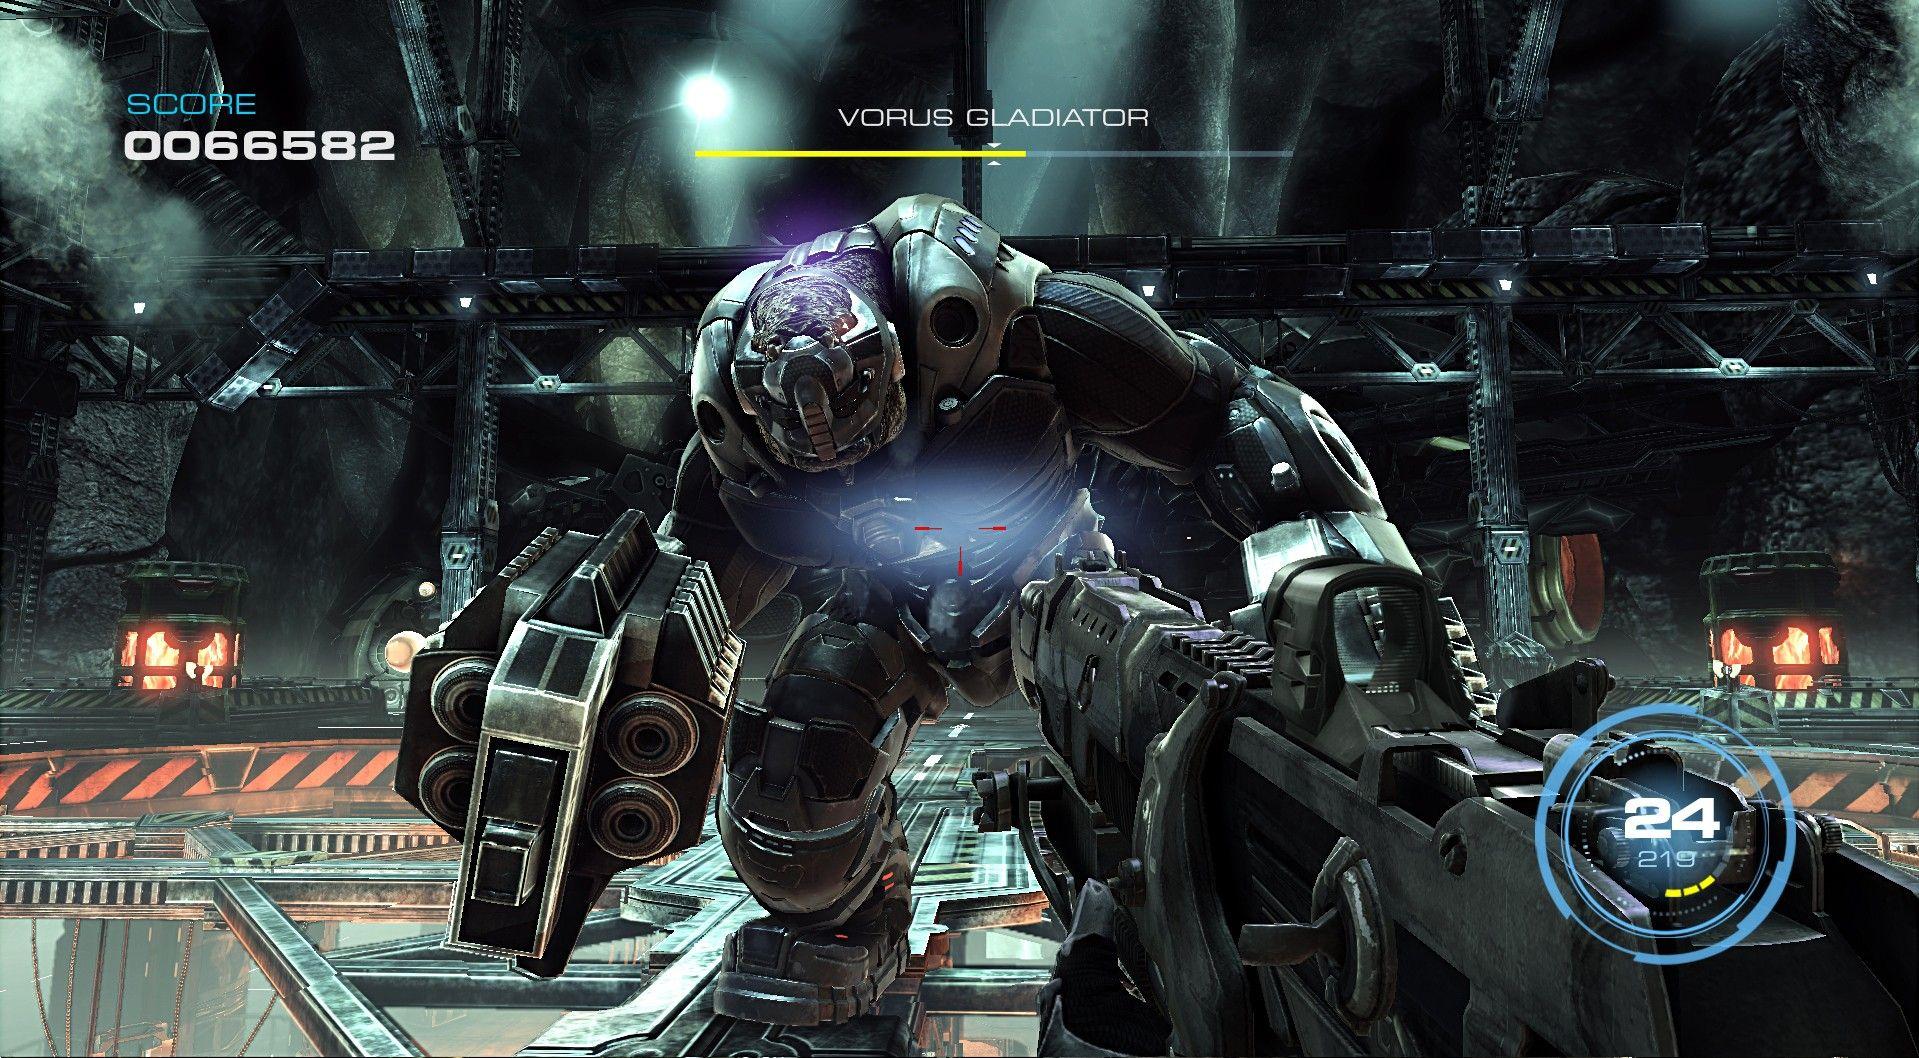 Download Game Pc Alien Rage Unlimited Download Games Pc Games Download Rage Game